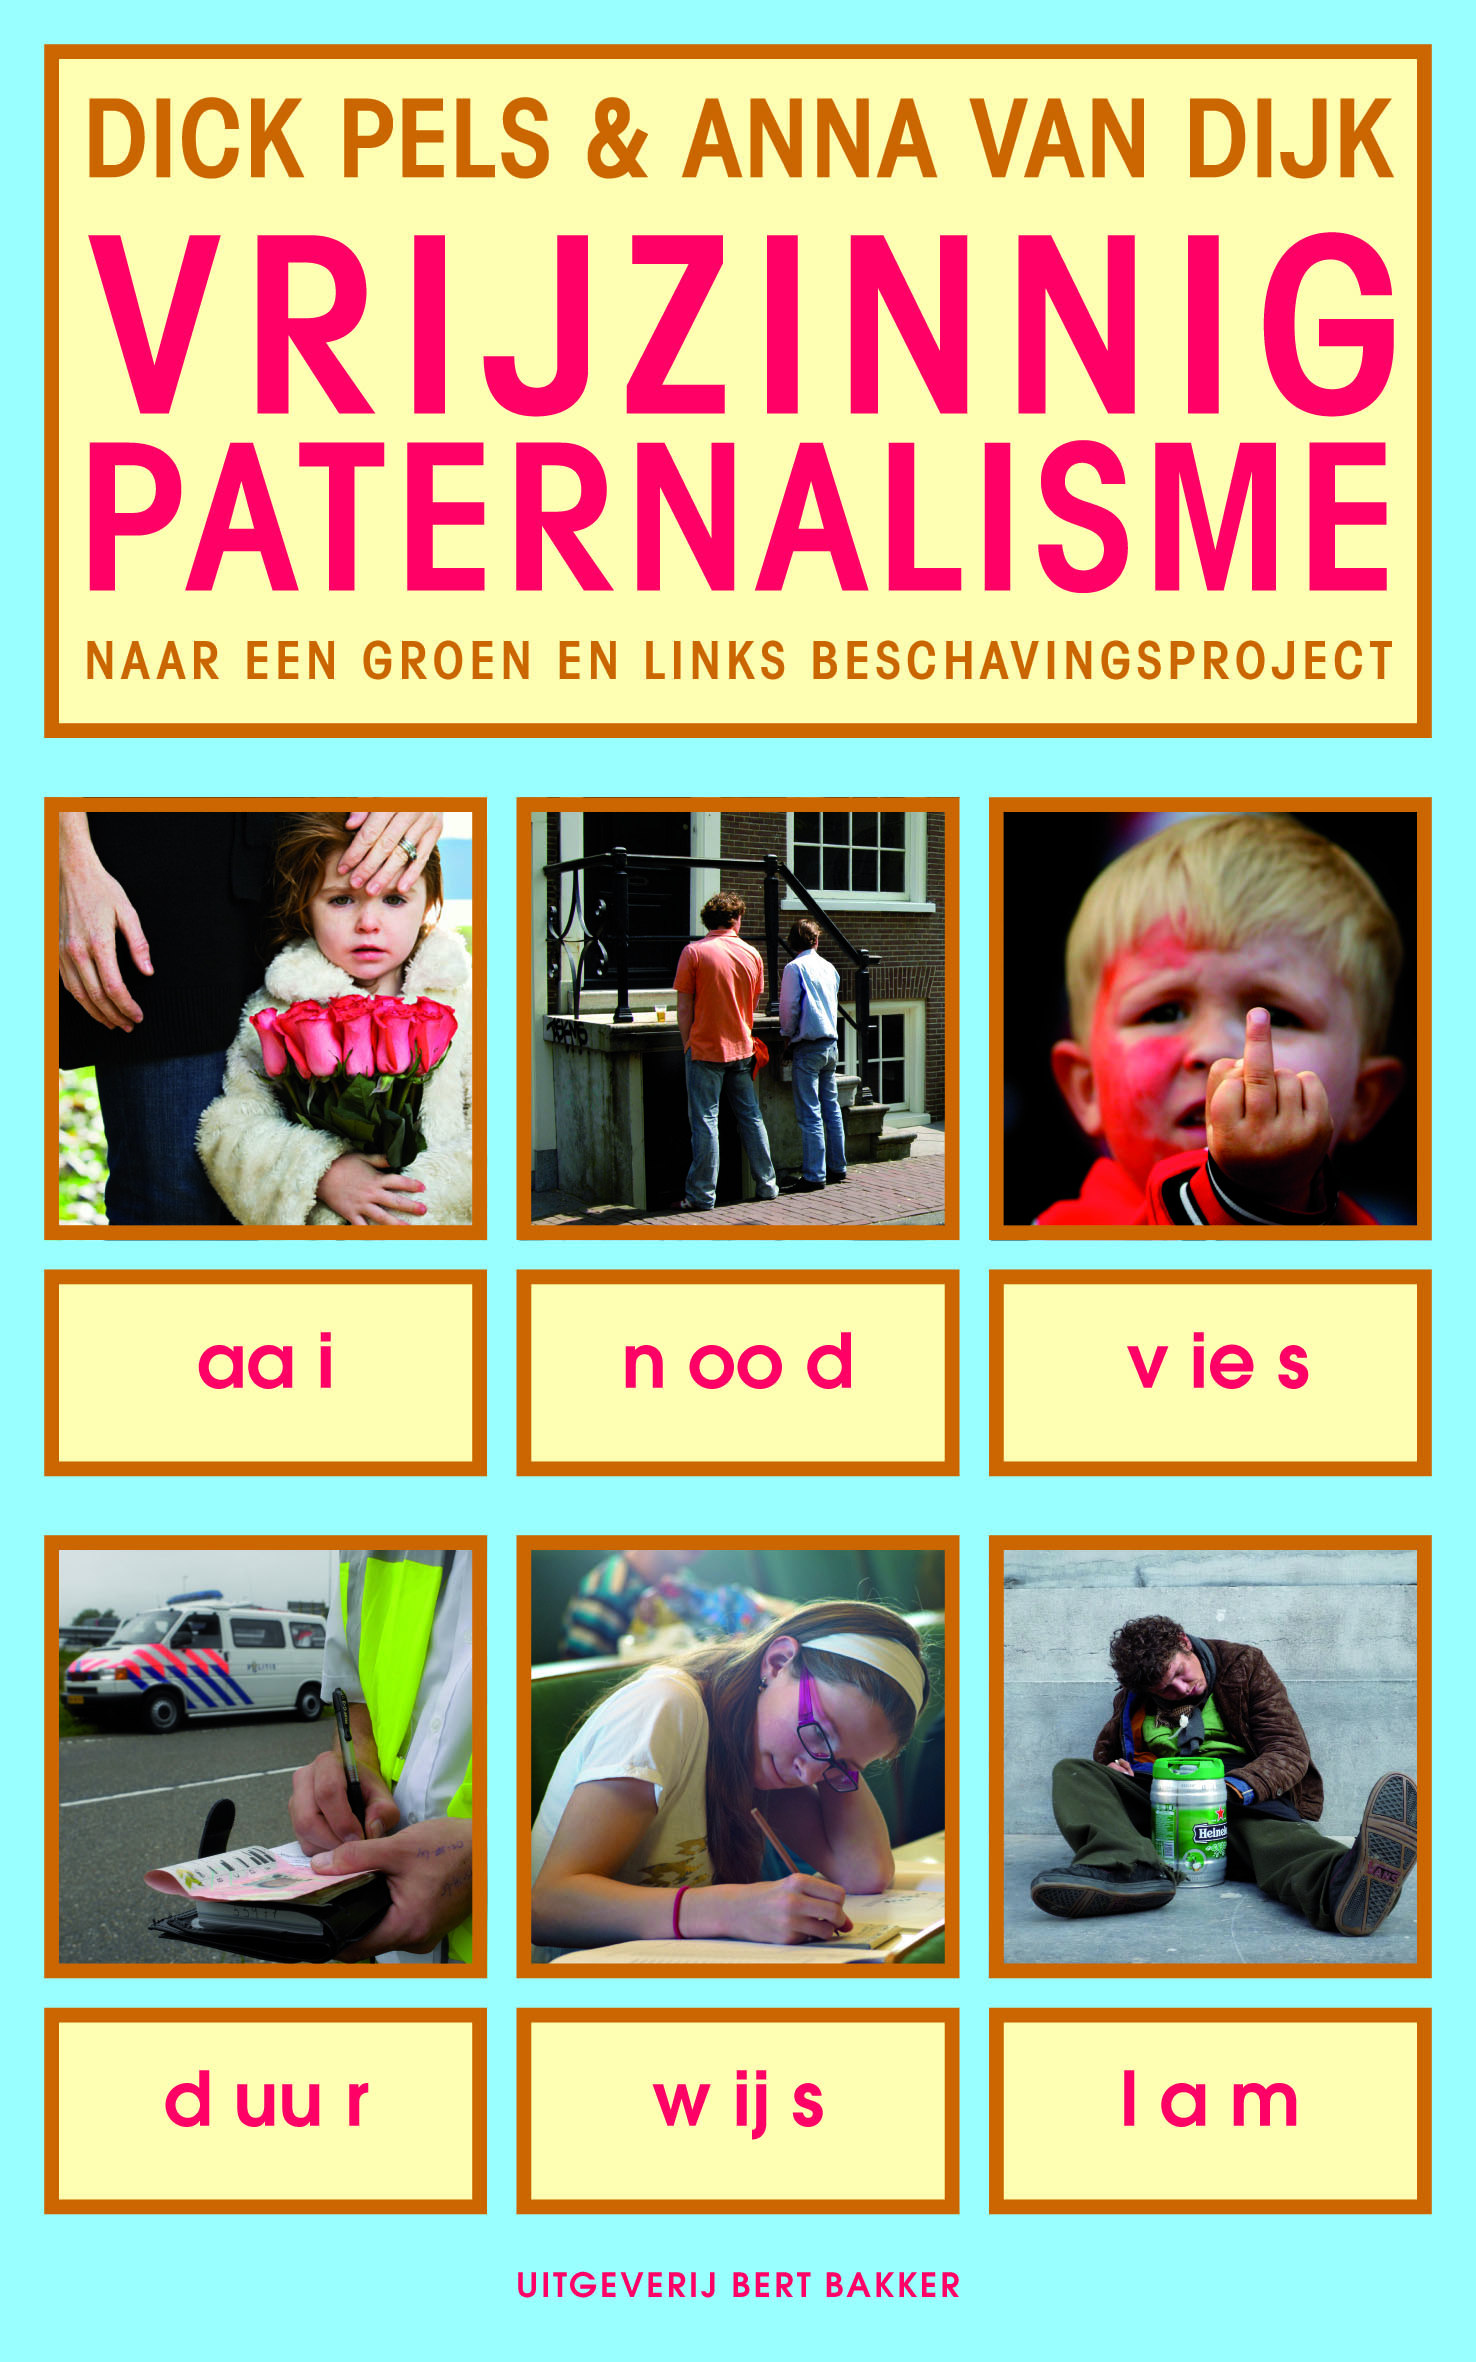 Vrijzinnig_paternalisme_voorplat_cmyk[1]